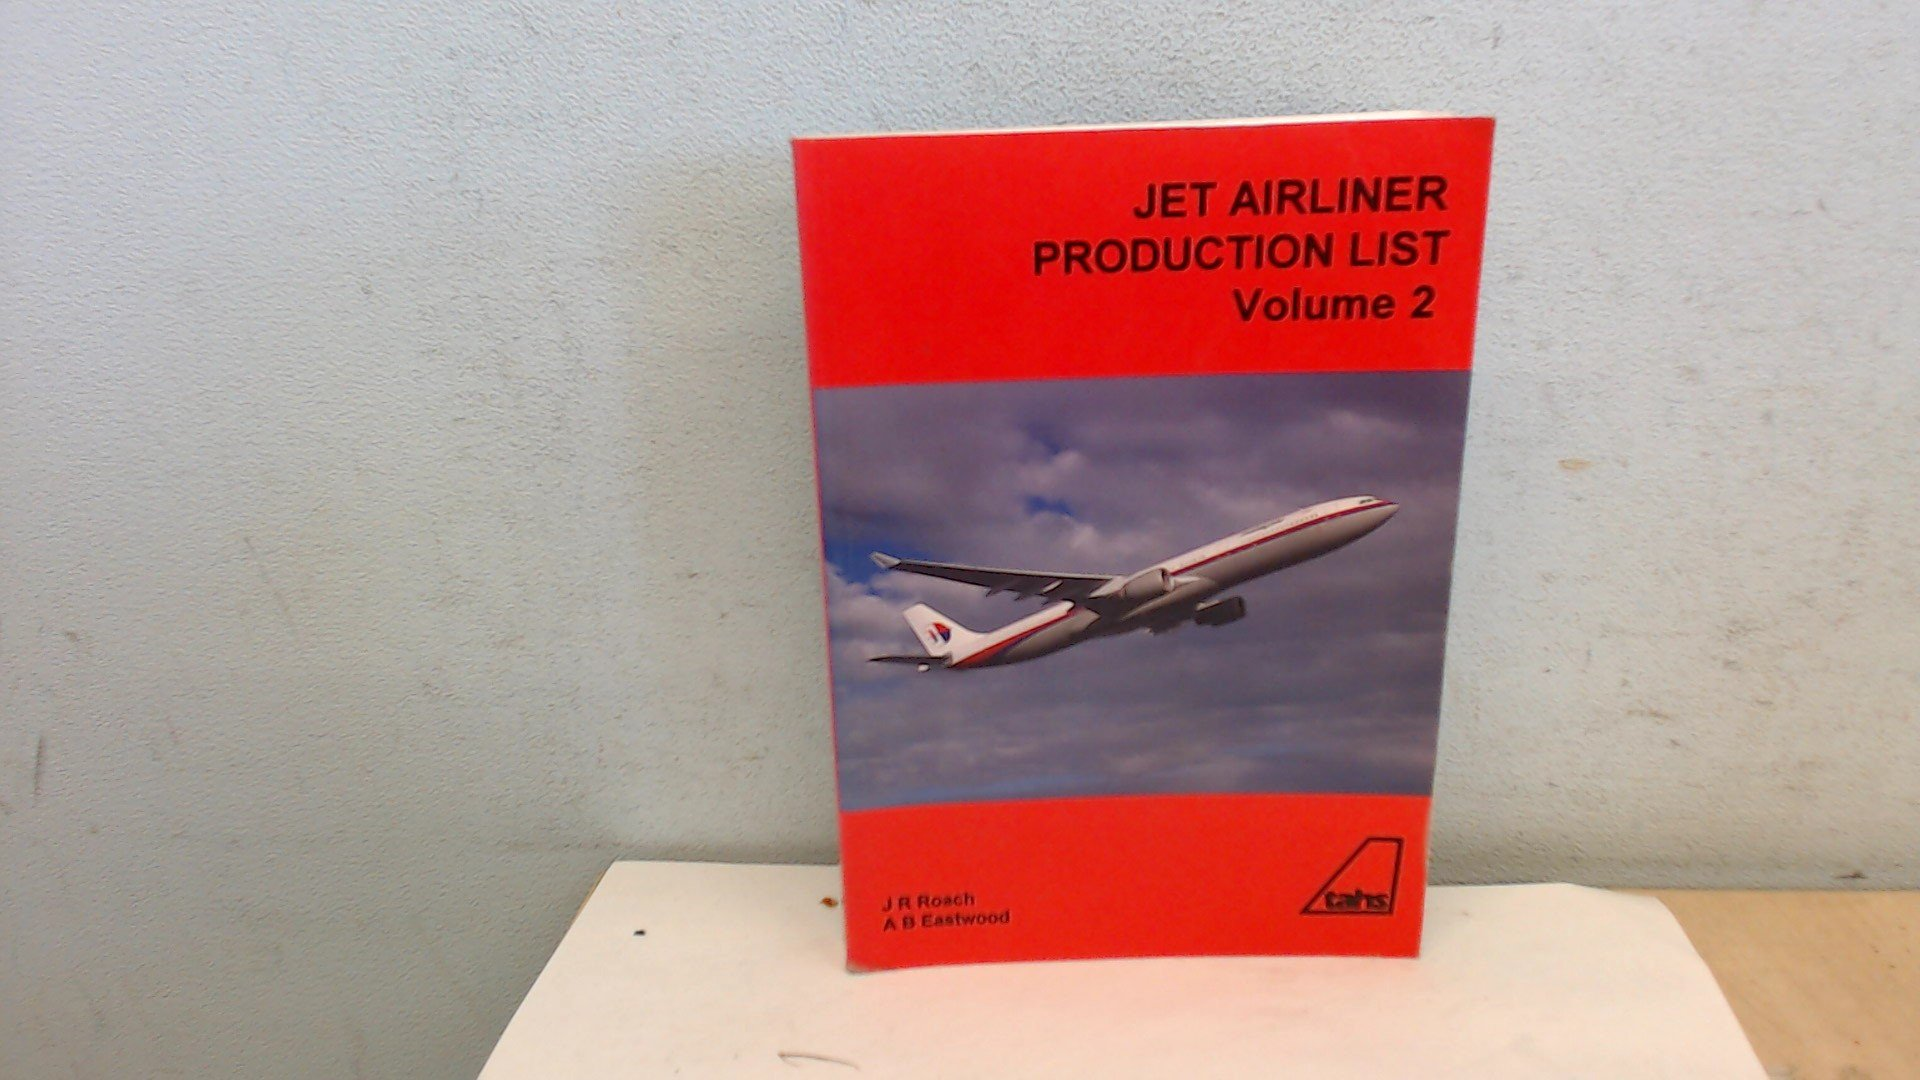 Jet Airliner Production List Volume 2: J R  Roach & A B